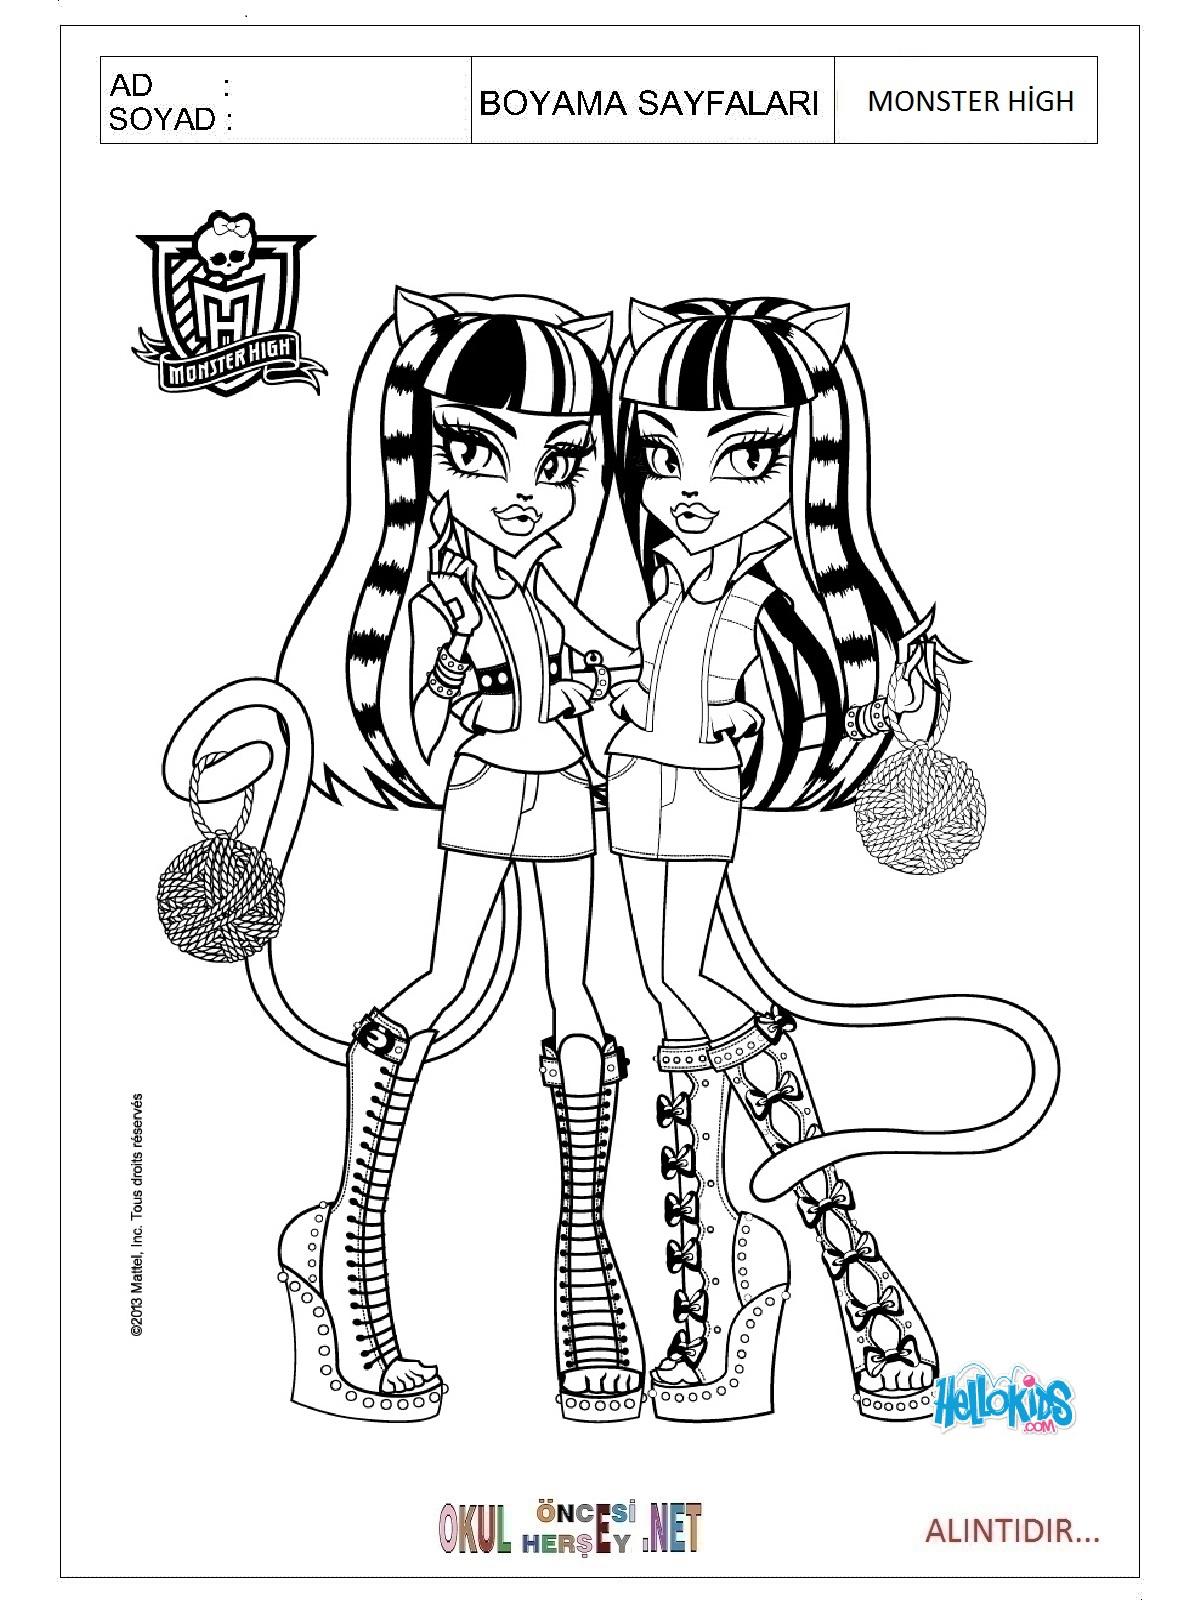 Monster High Boyama Sayfalari